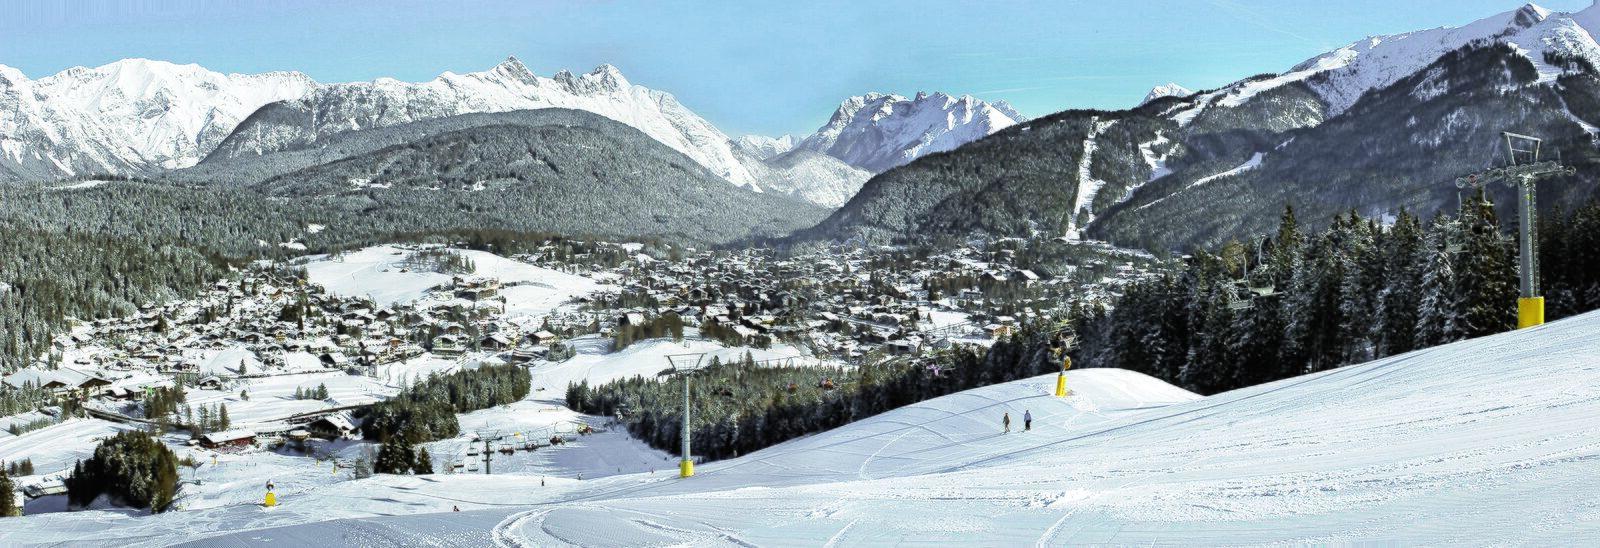 Skigebied Gschwandtkopf Seefeld